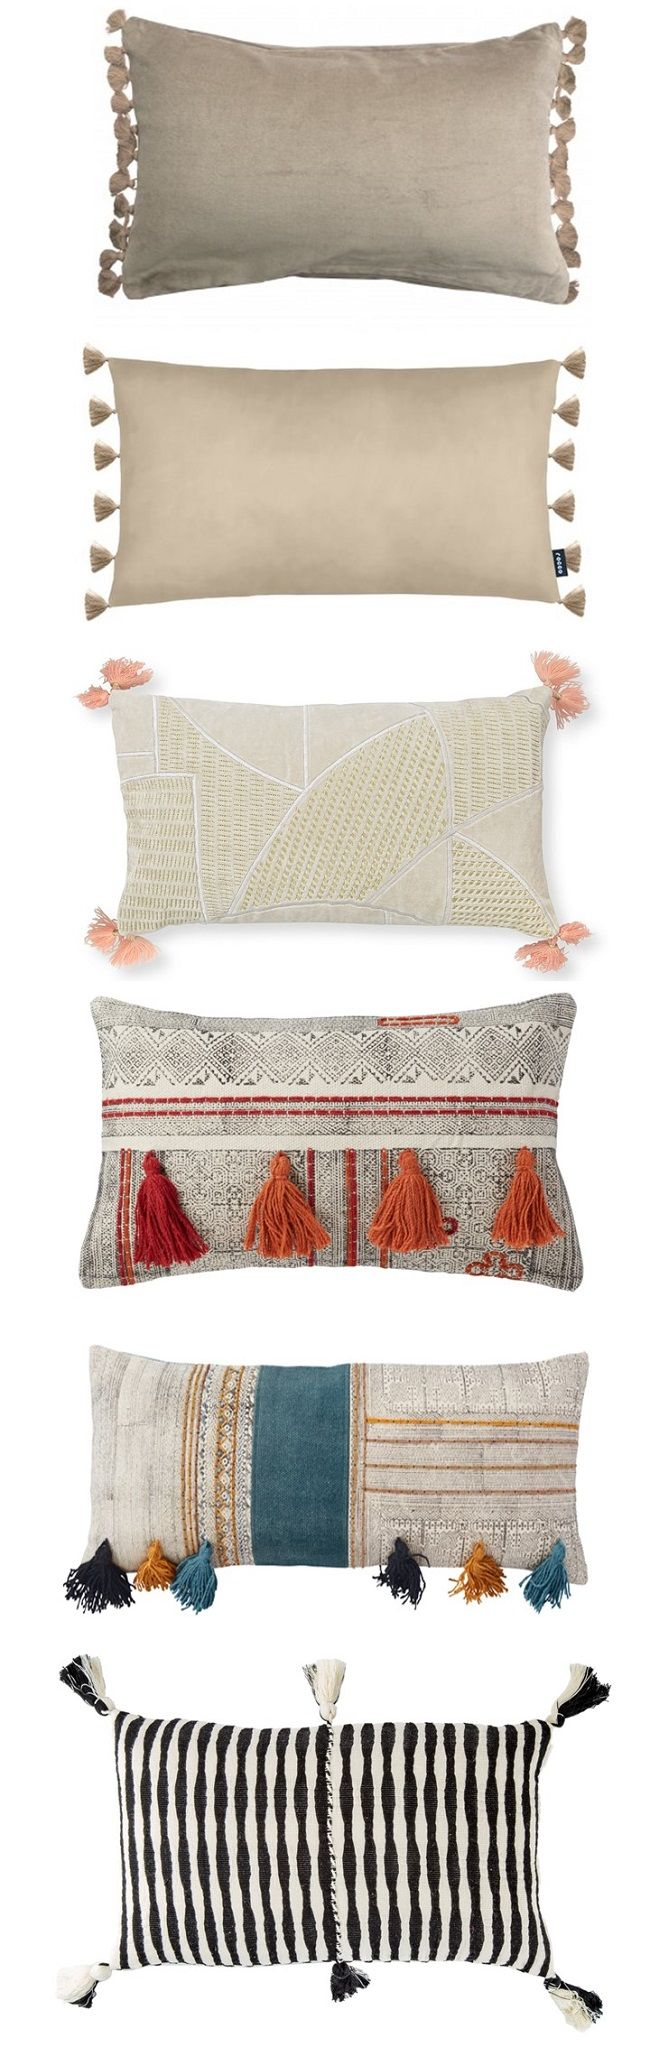 decorative rectangular tassel cushions, moodboard